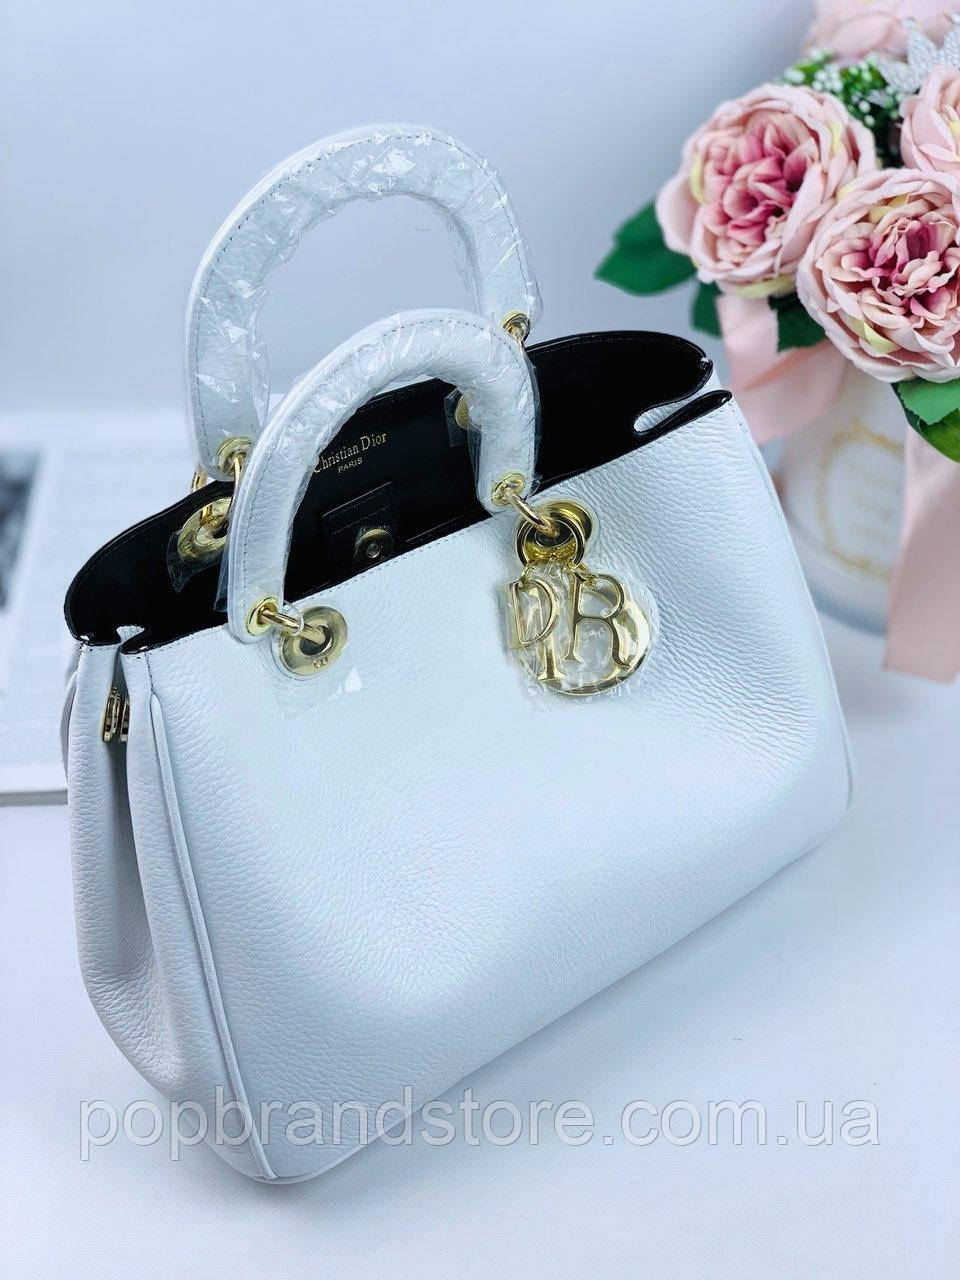 f5fe89870d16 Женская кожаная сумка DIOR Diorissimo lux (реплика) - Pop Brand Store |  брендовые сумки